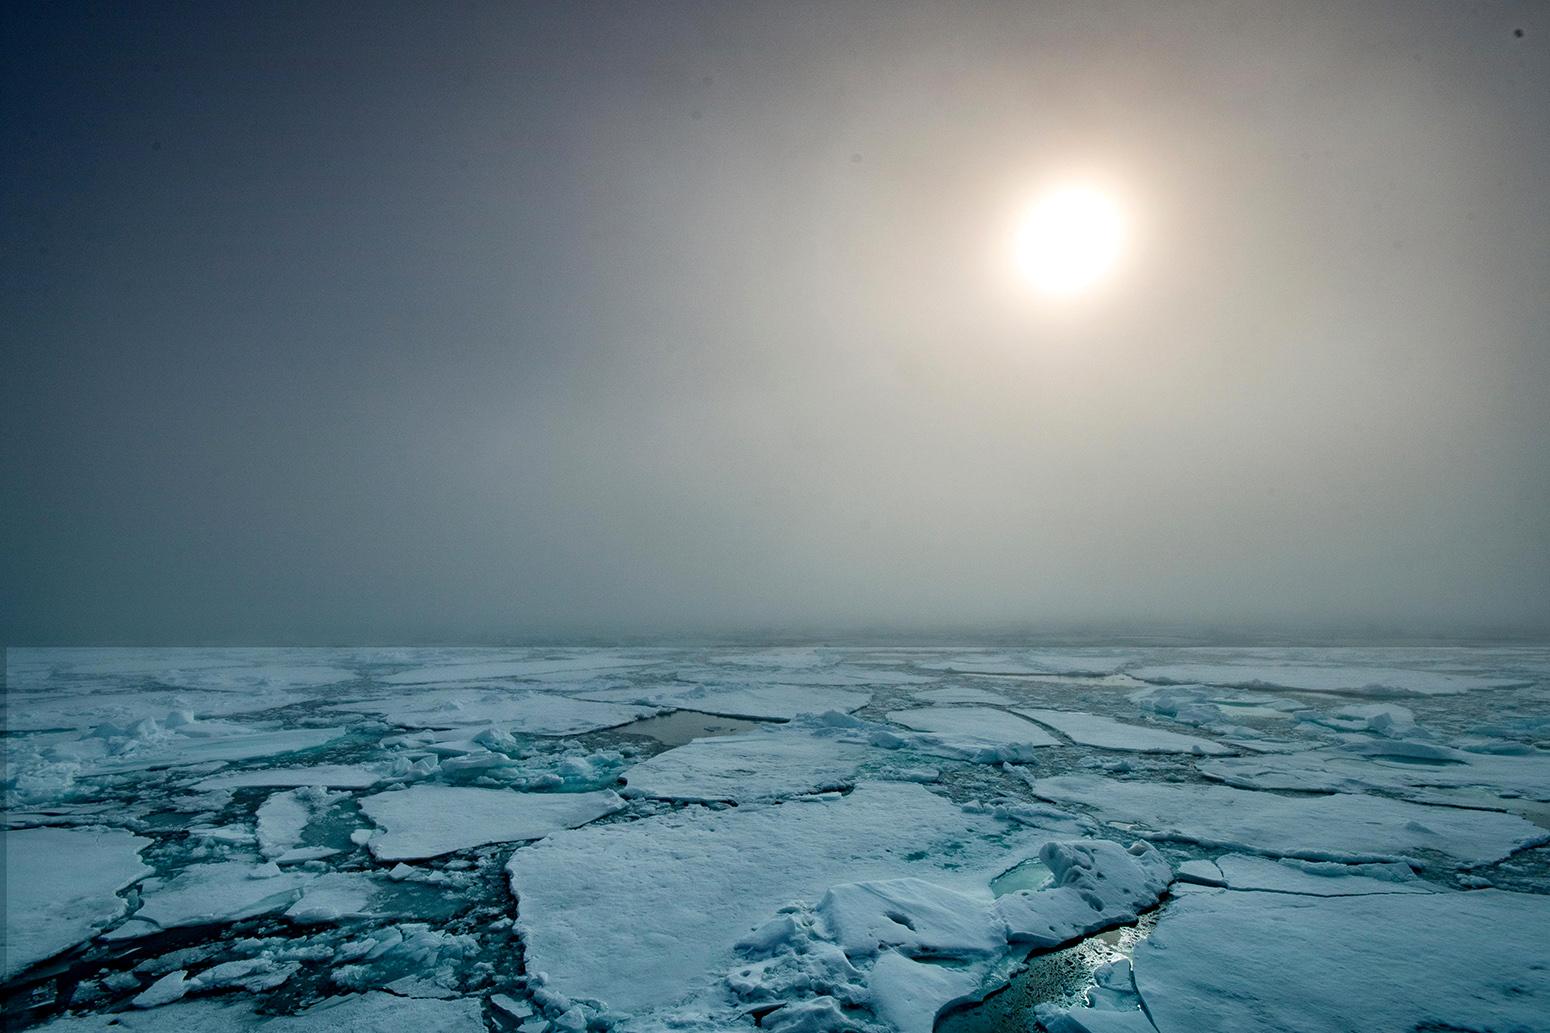 Arctic sea ice breaking apart. Credit: Jenna Chamberlain / Alamy Stock Photo. PE9R7J